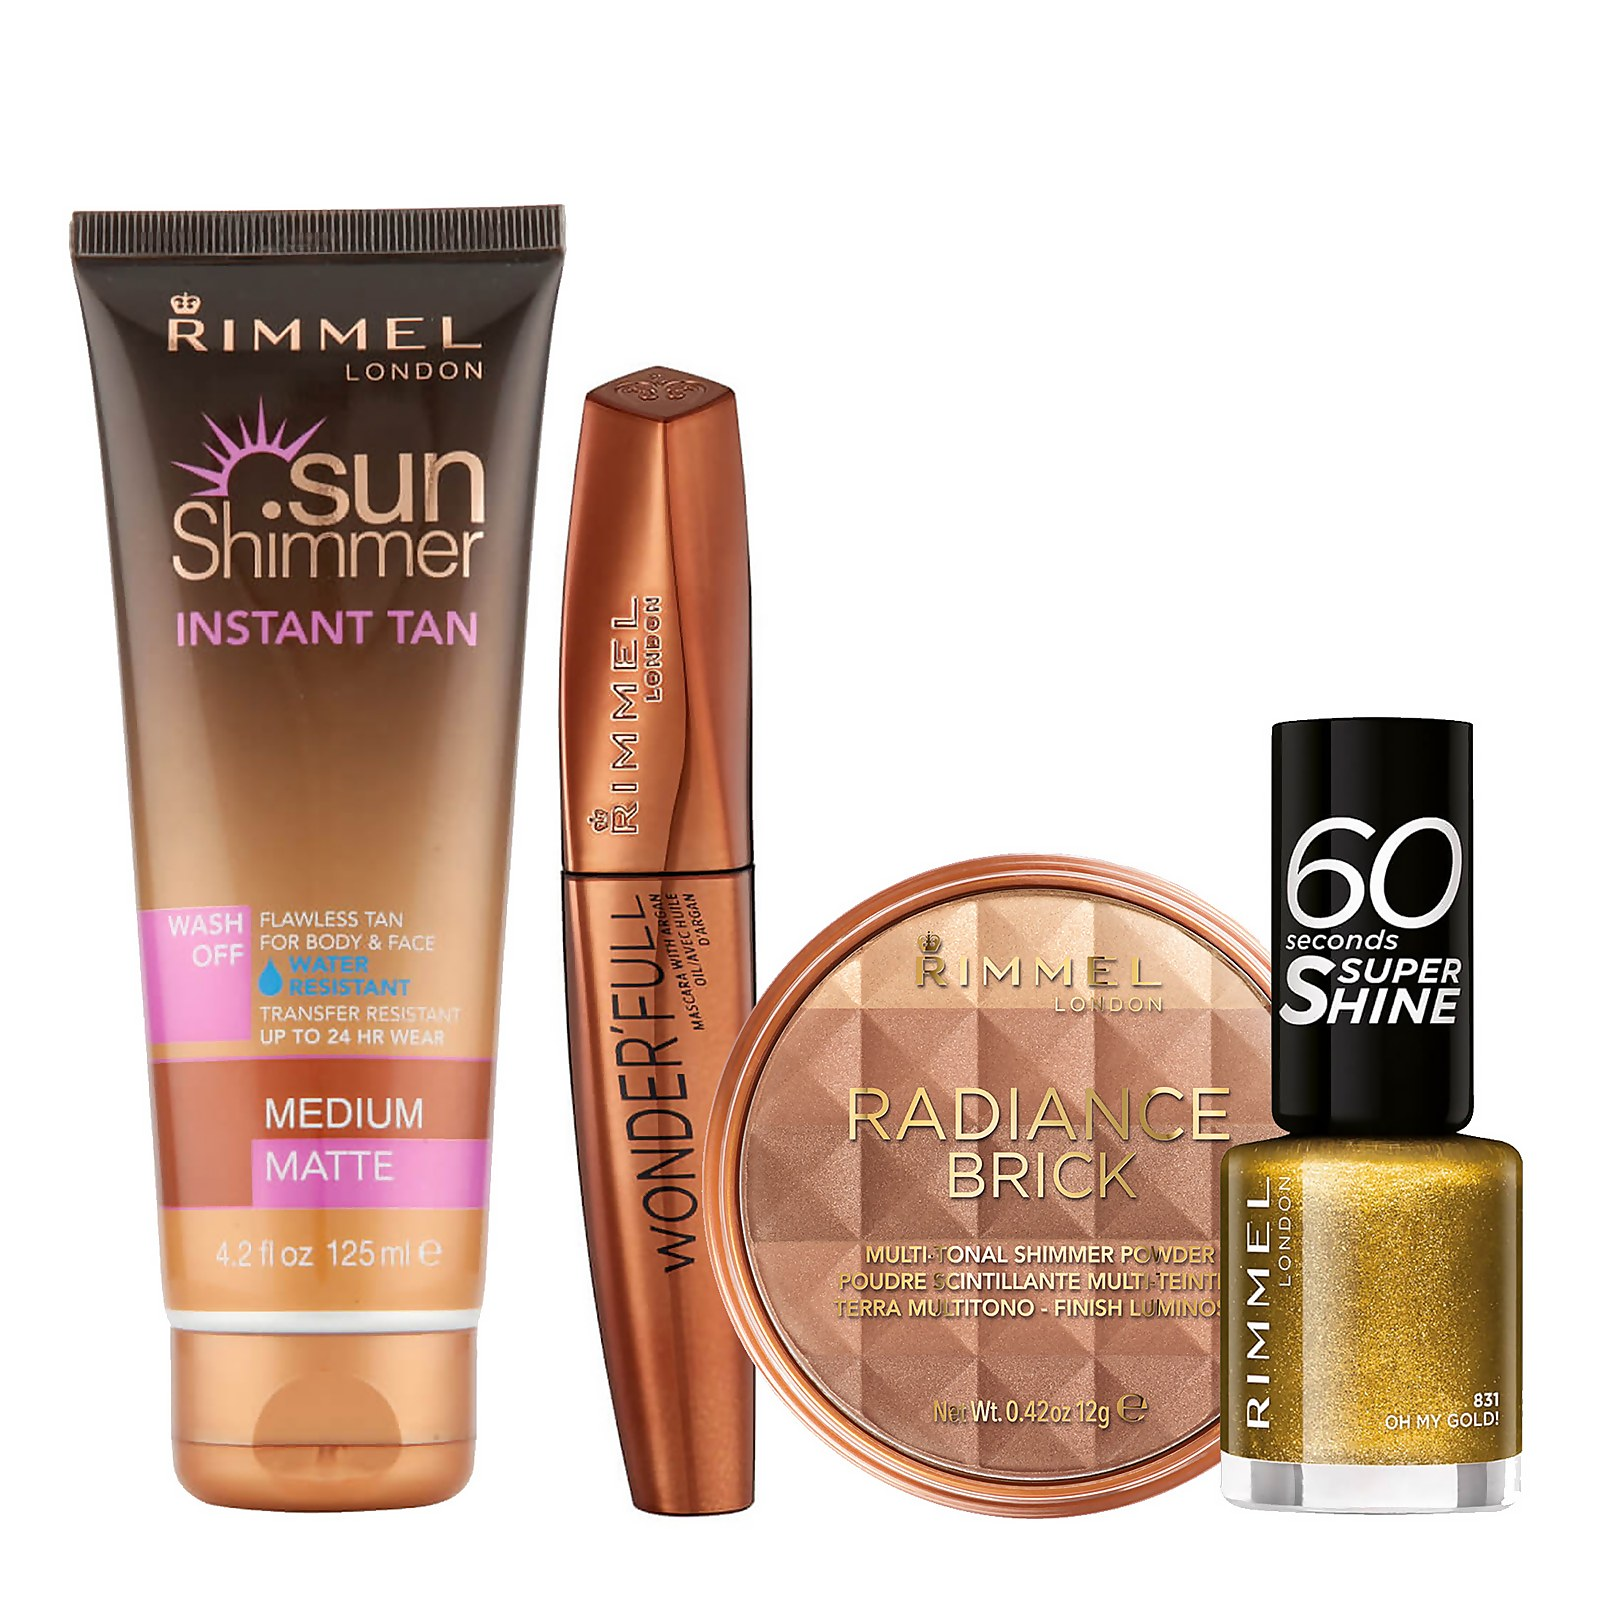 Rimmel Bronze Beauty Bundle (Worth £26.46)